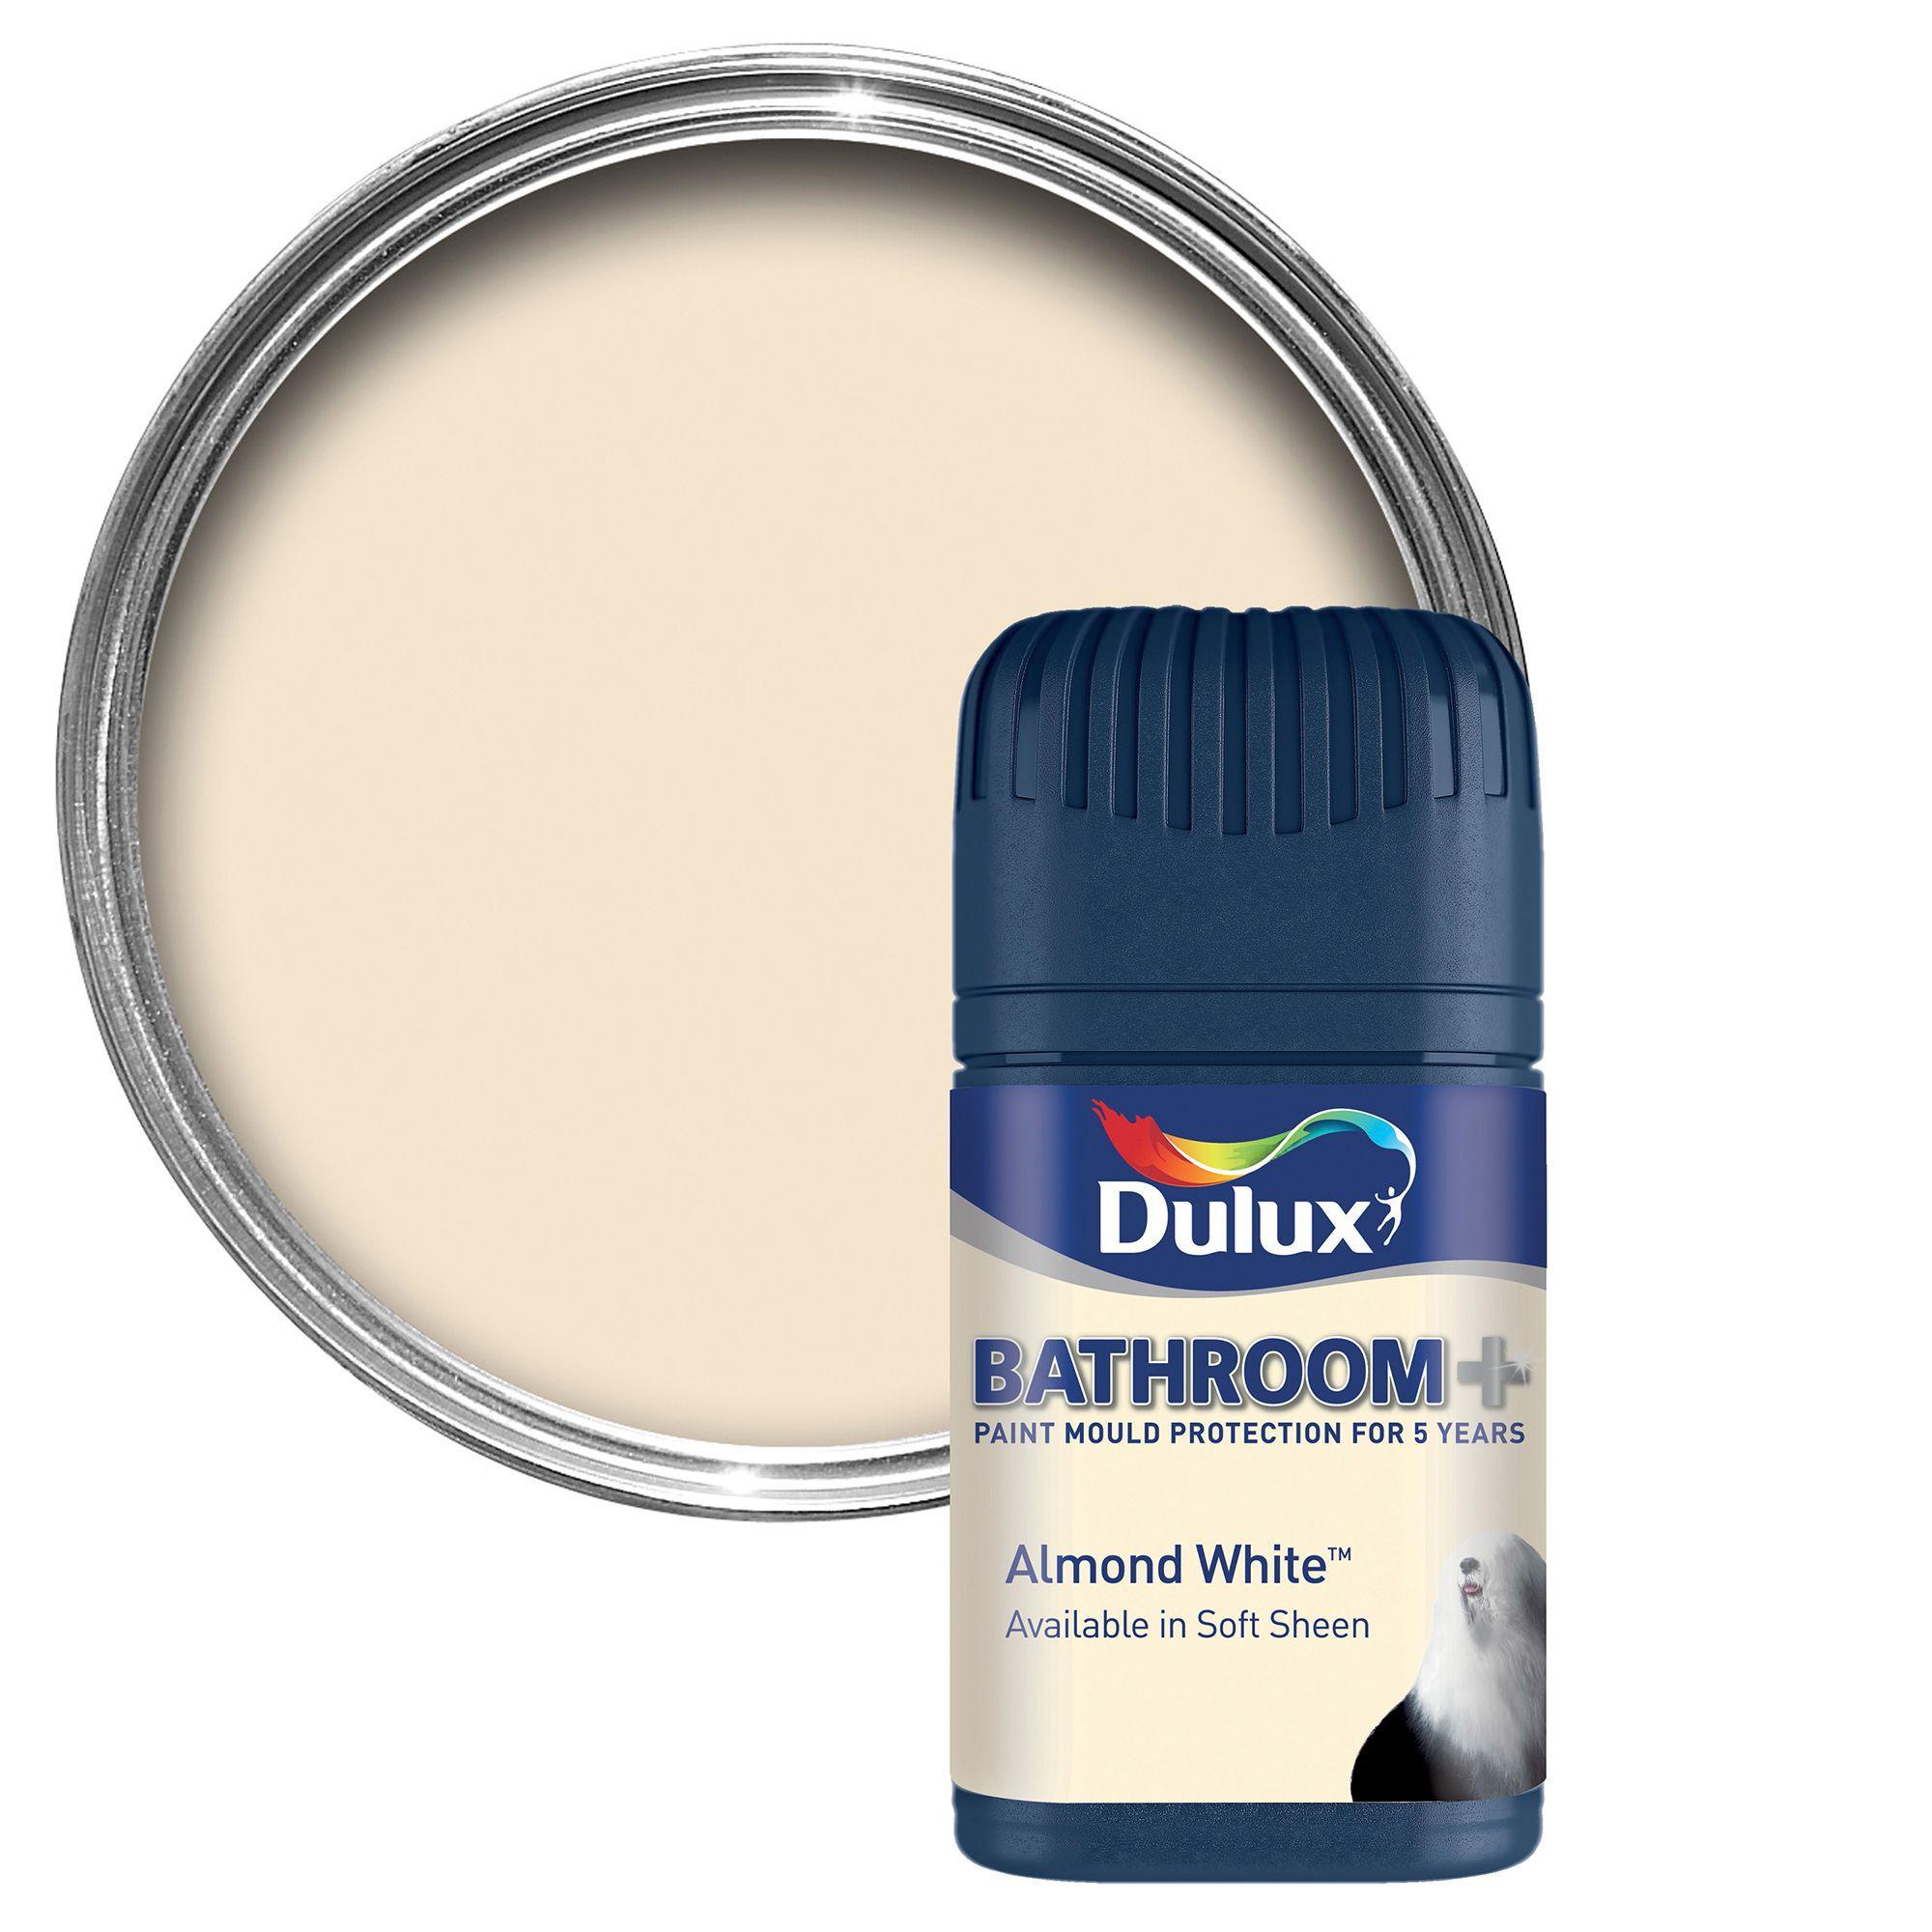 Paint Tester dulux bathroom+ almond white soft sheen emulsion paint 50ml tester